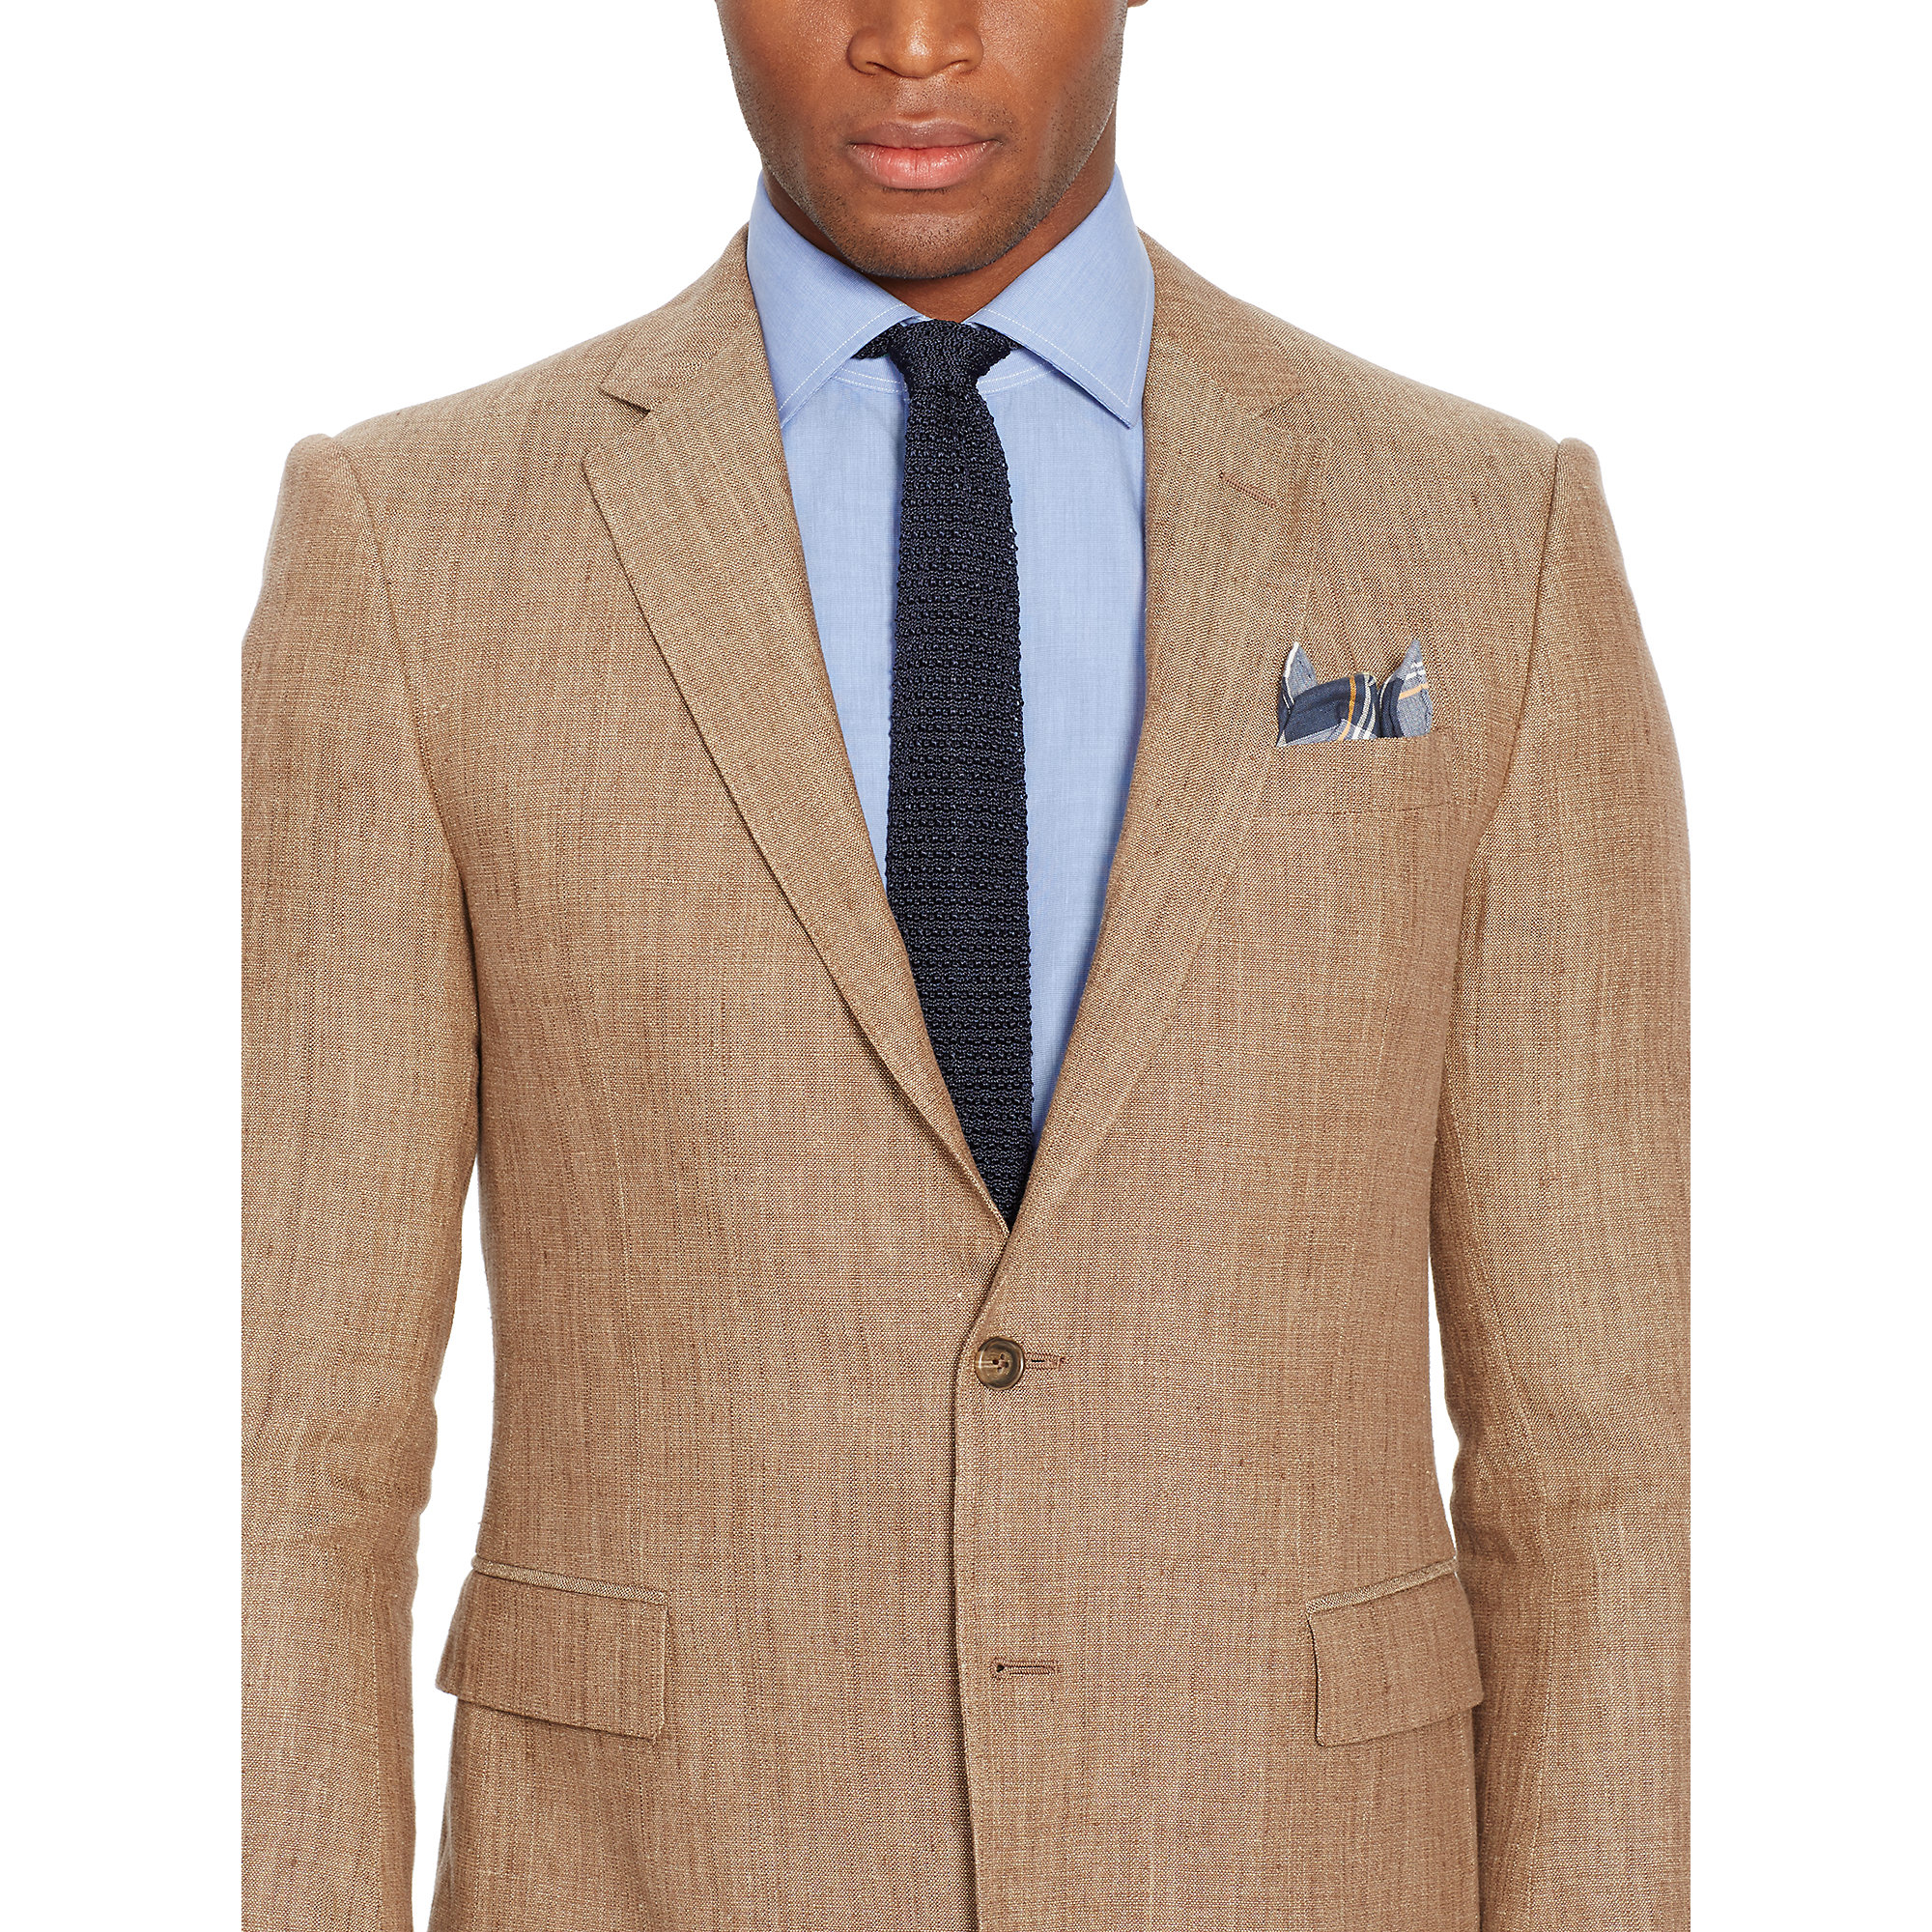 Polo ralph lauren Connery Linen Sport Coat in Natural for Men   Lyst